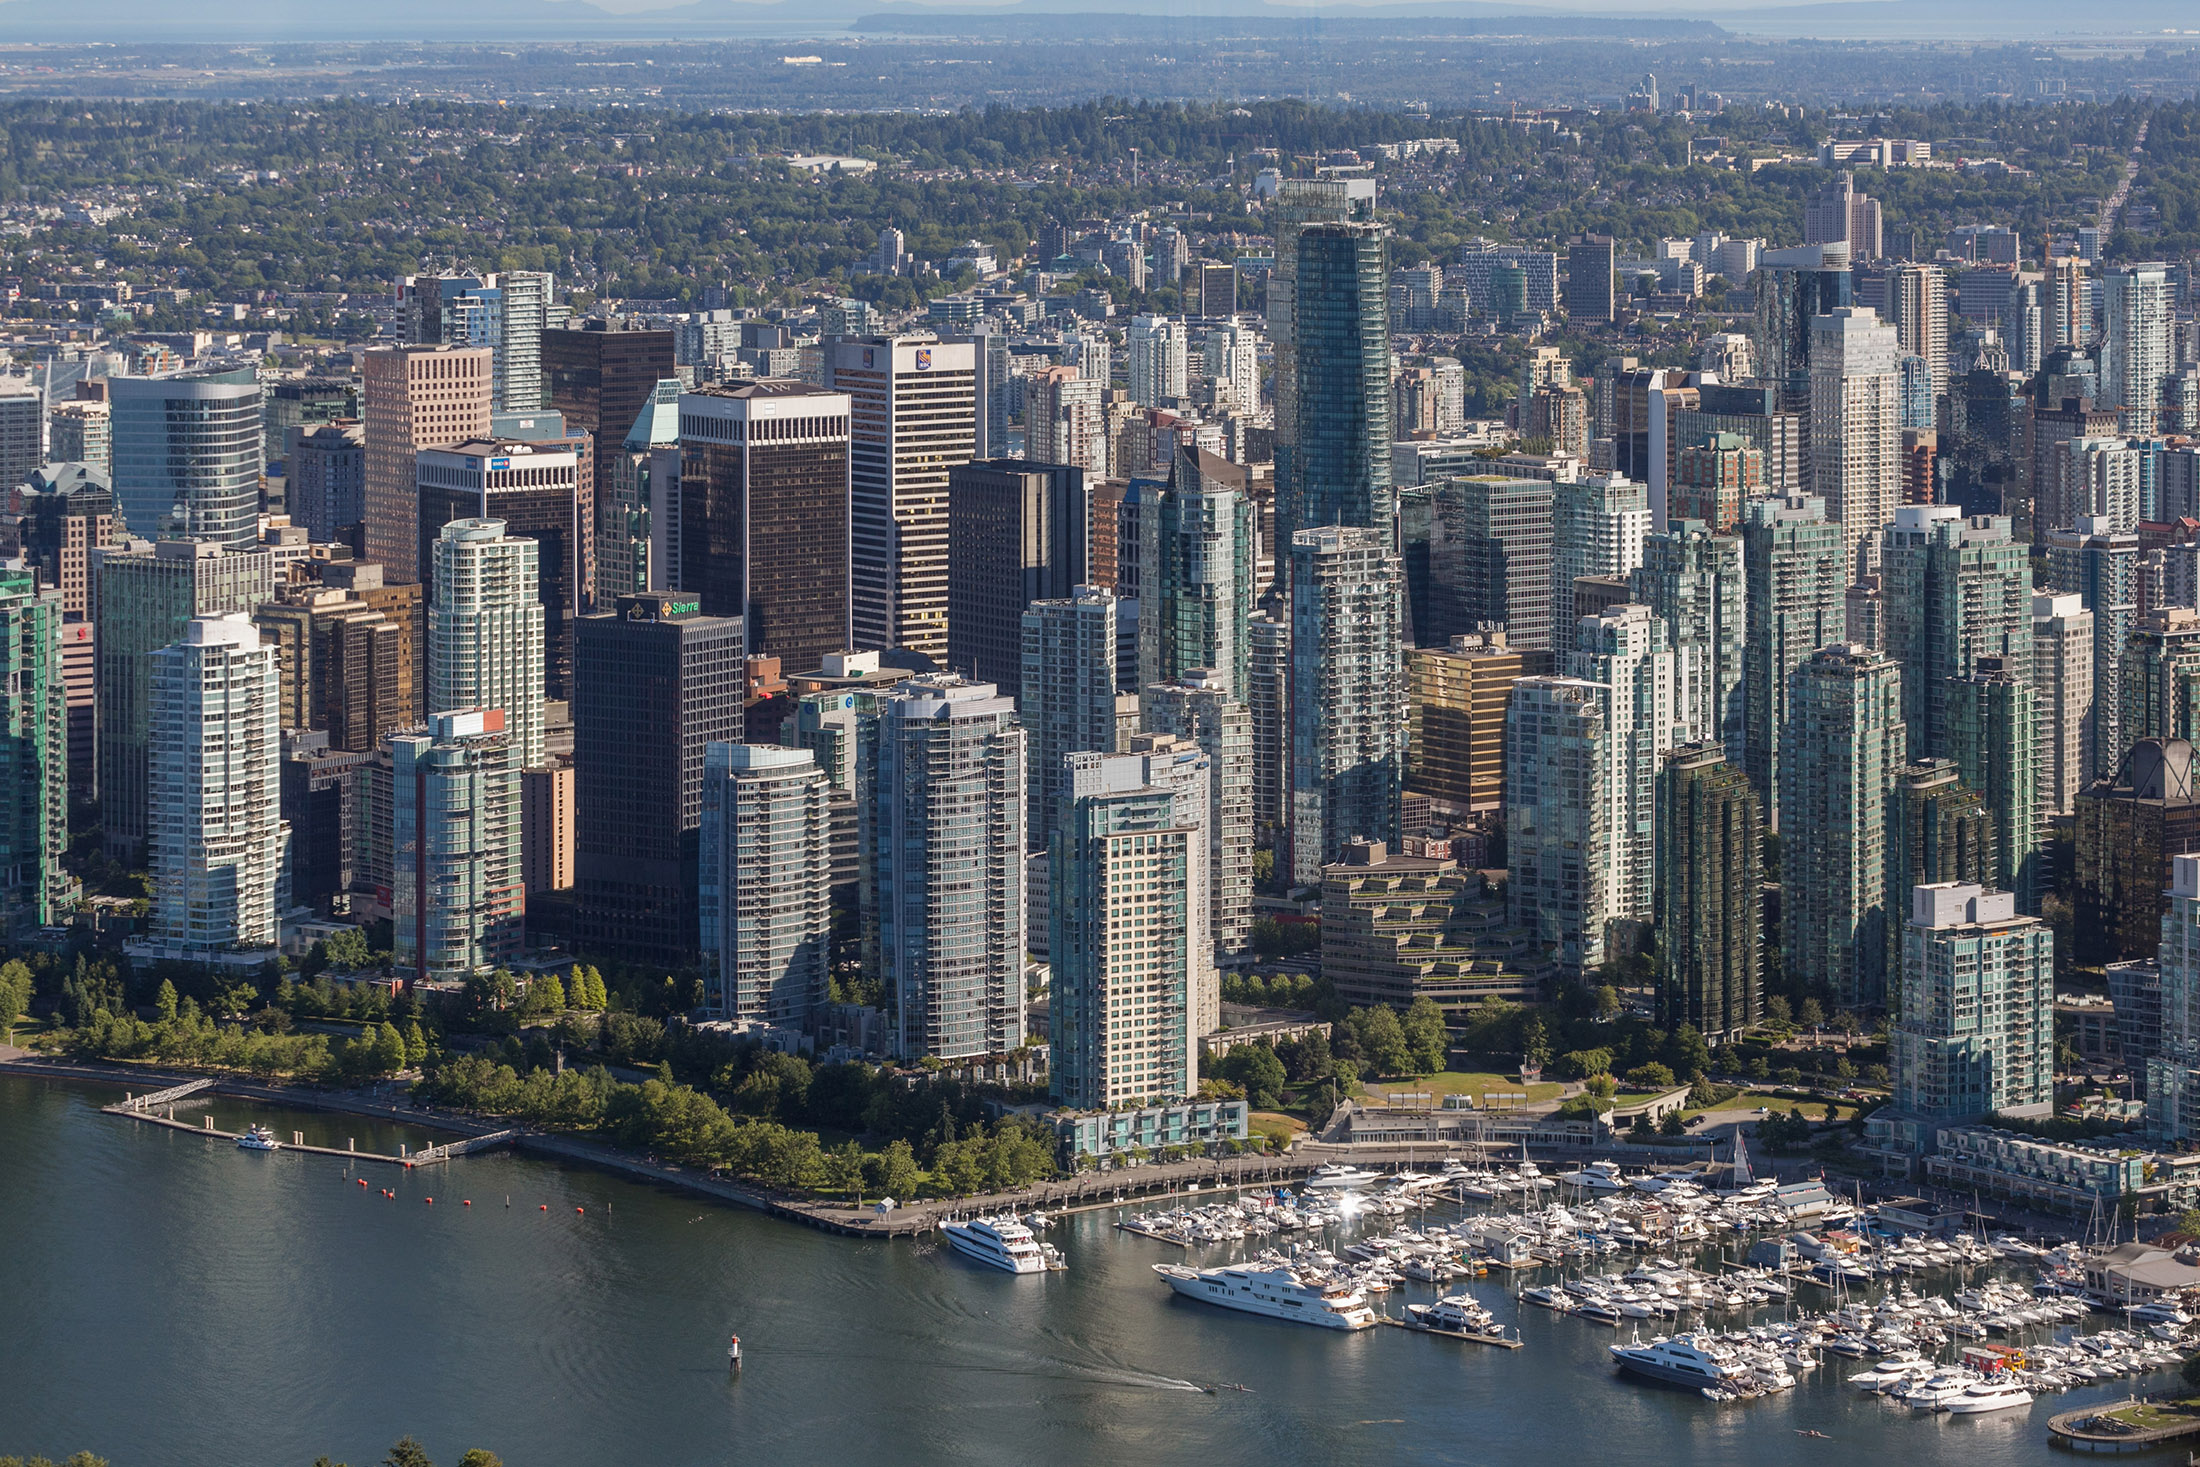 Aerial view of Vancouver Coal Harbour neighbourhood